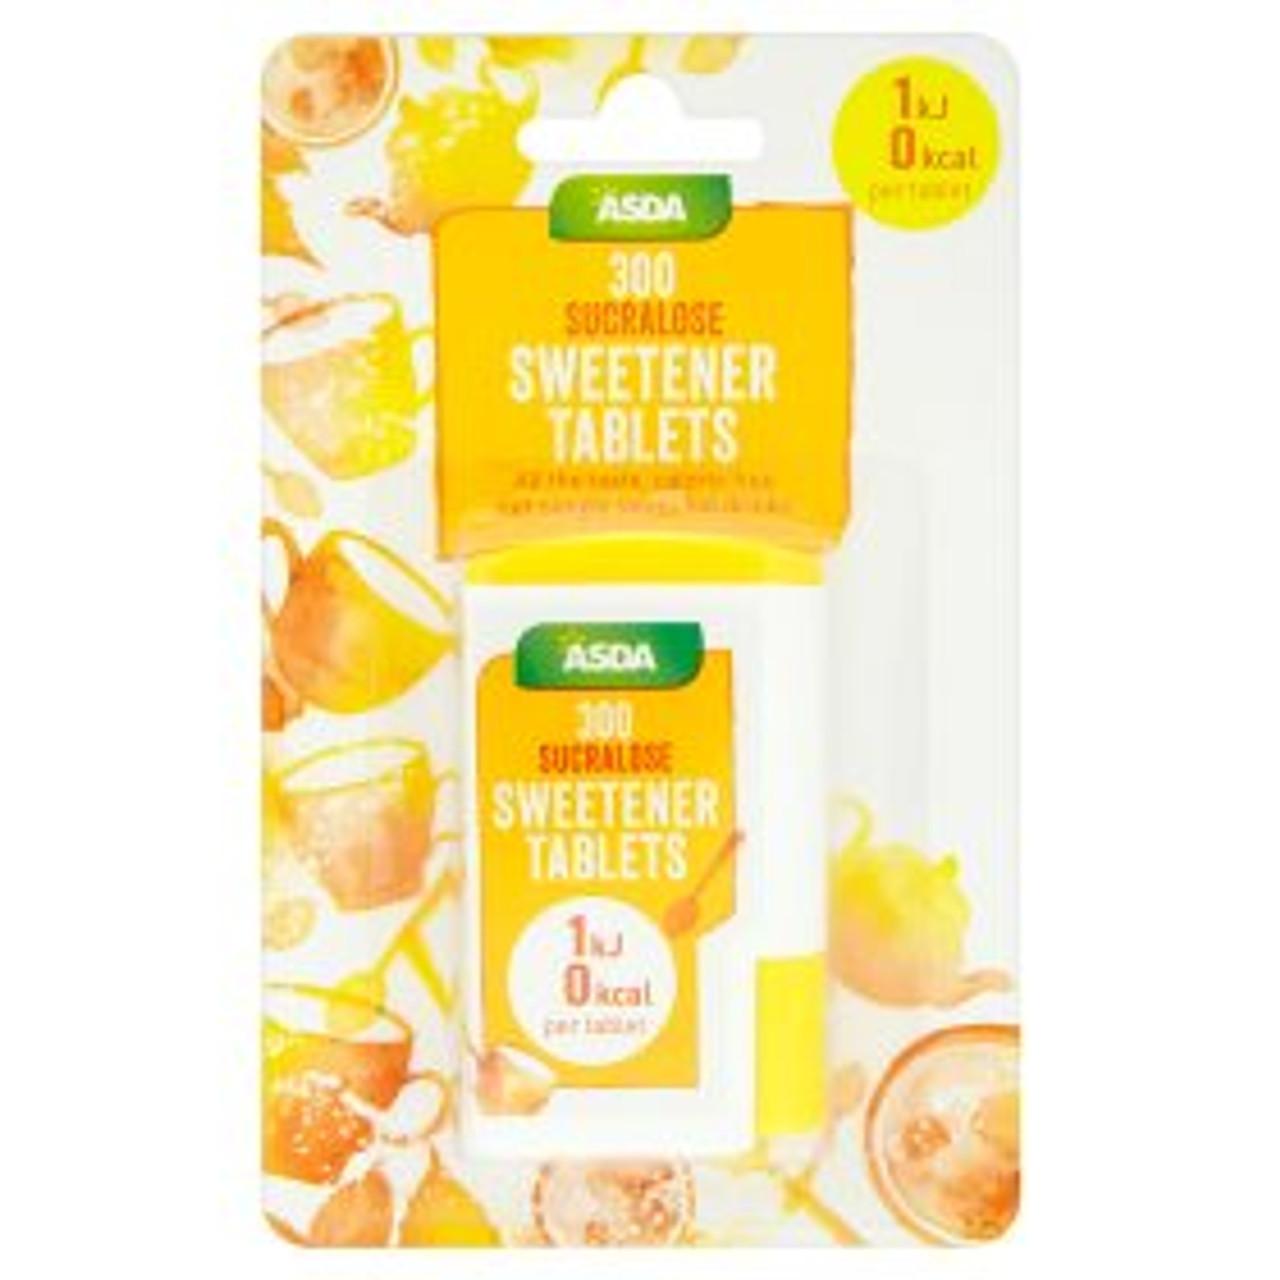 Asda Low Calorie Sweetener Tablets 300pk